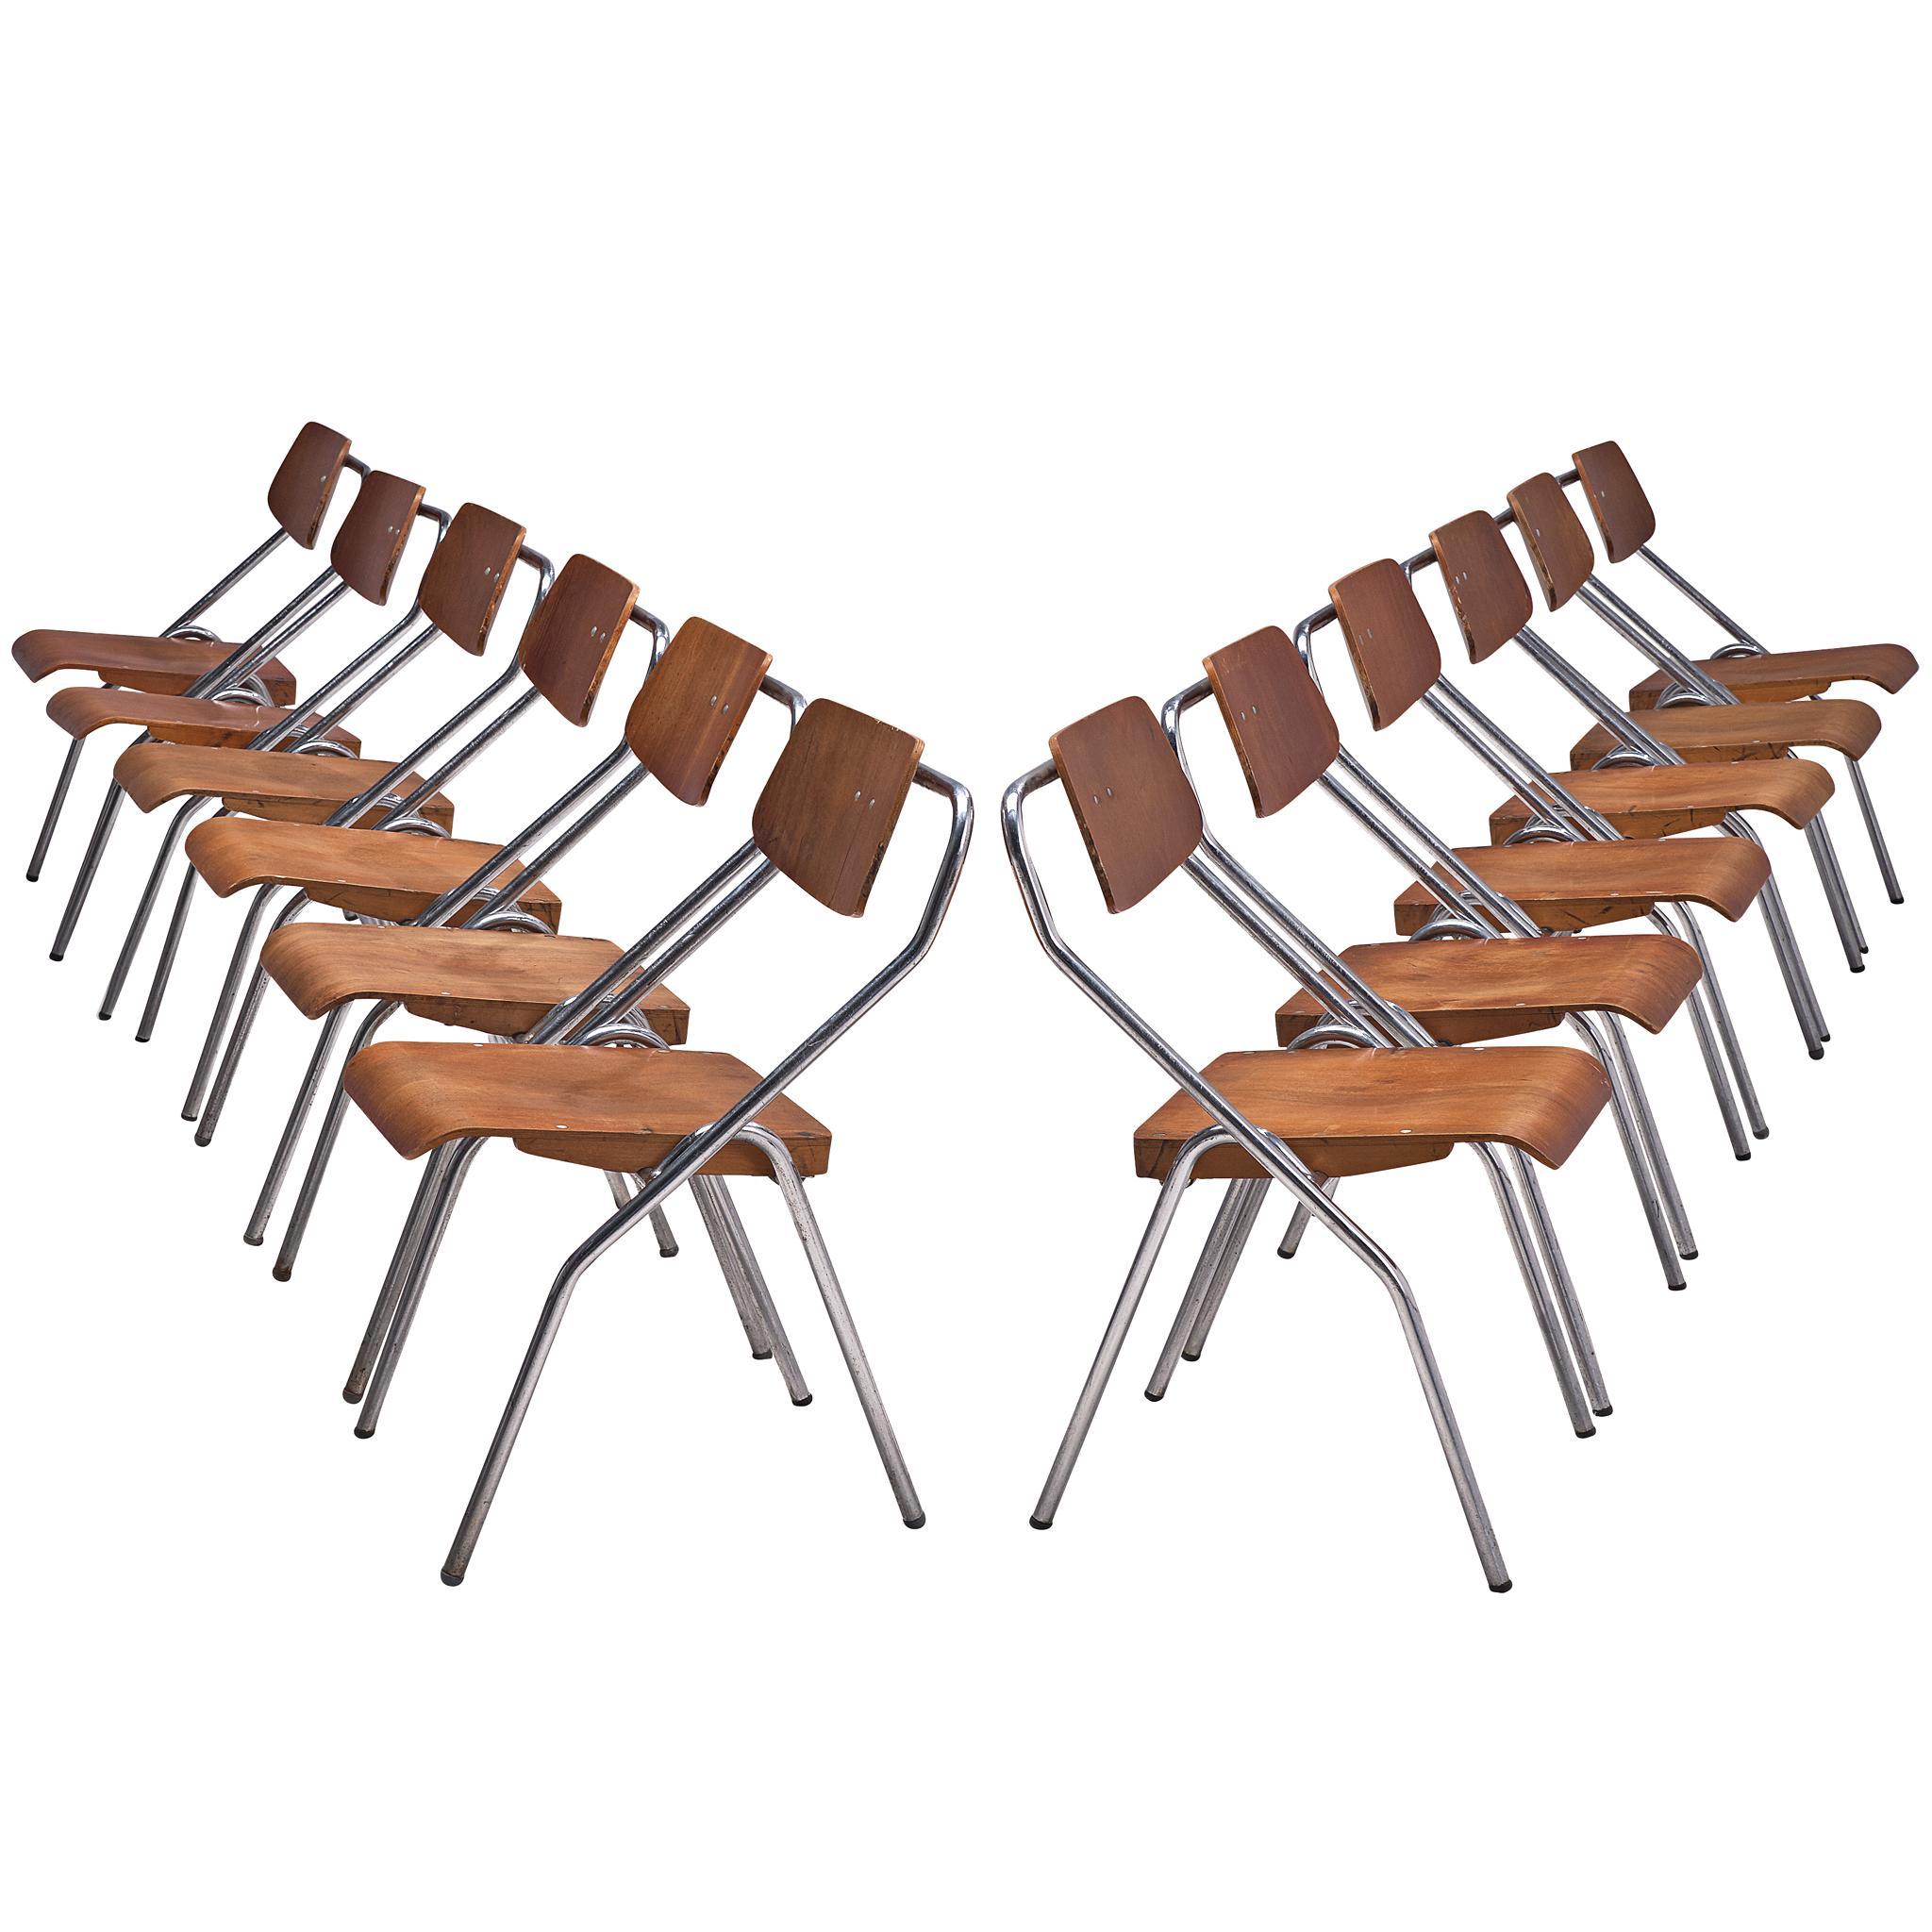 Set of Twelve Chairs with Tubular Frame